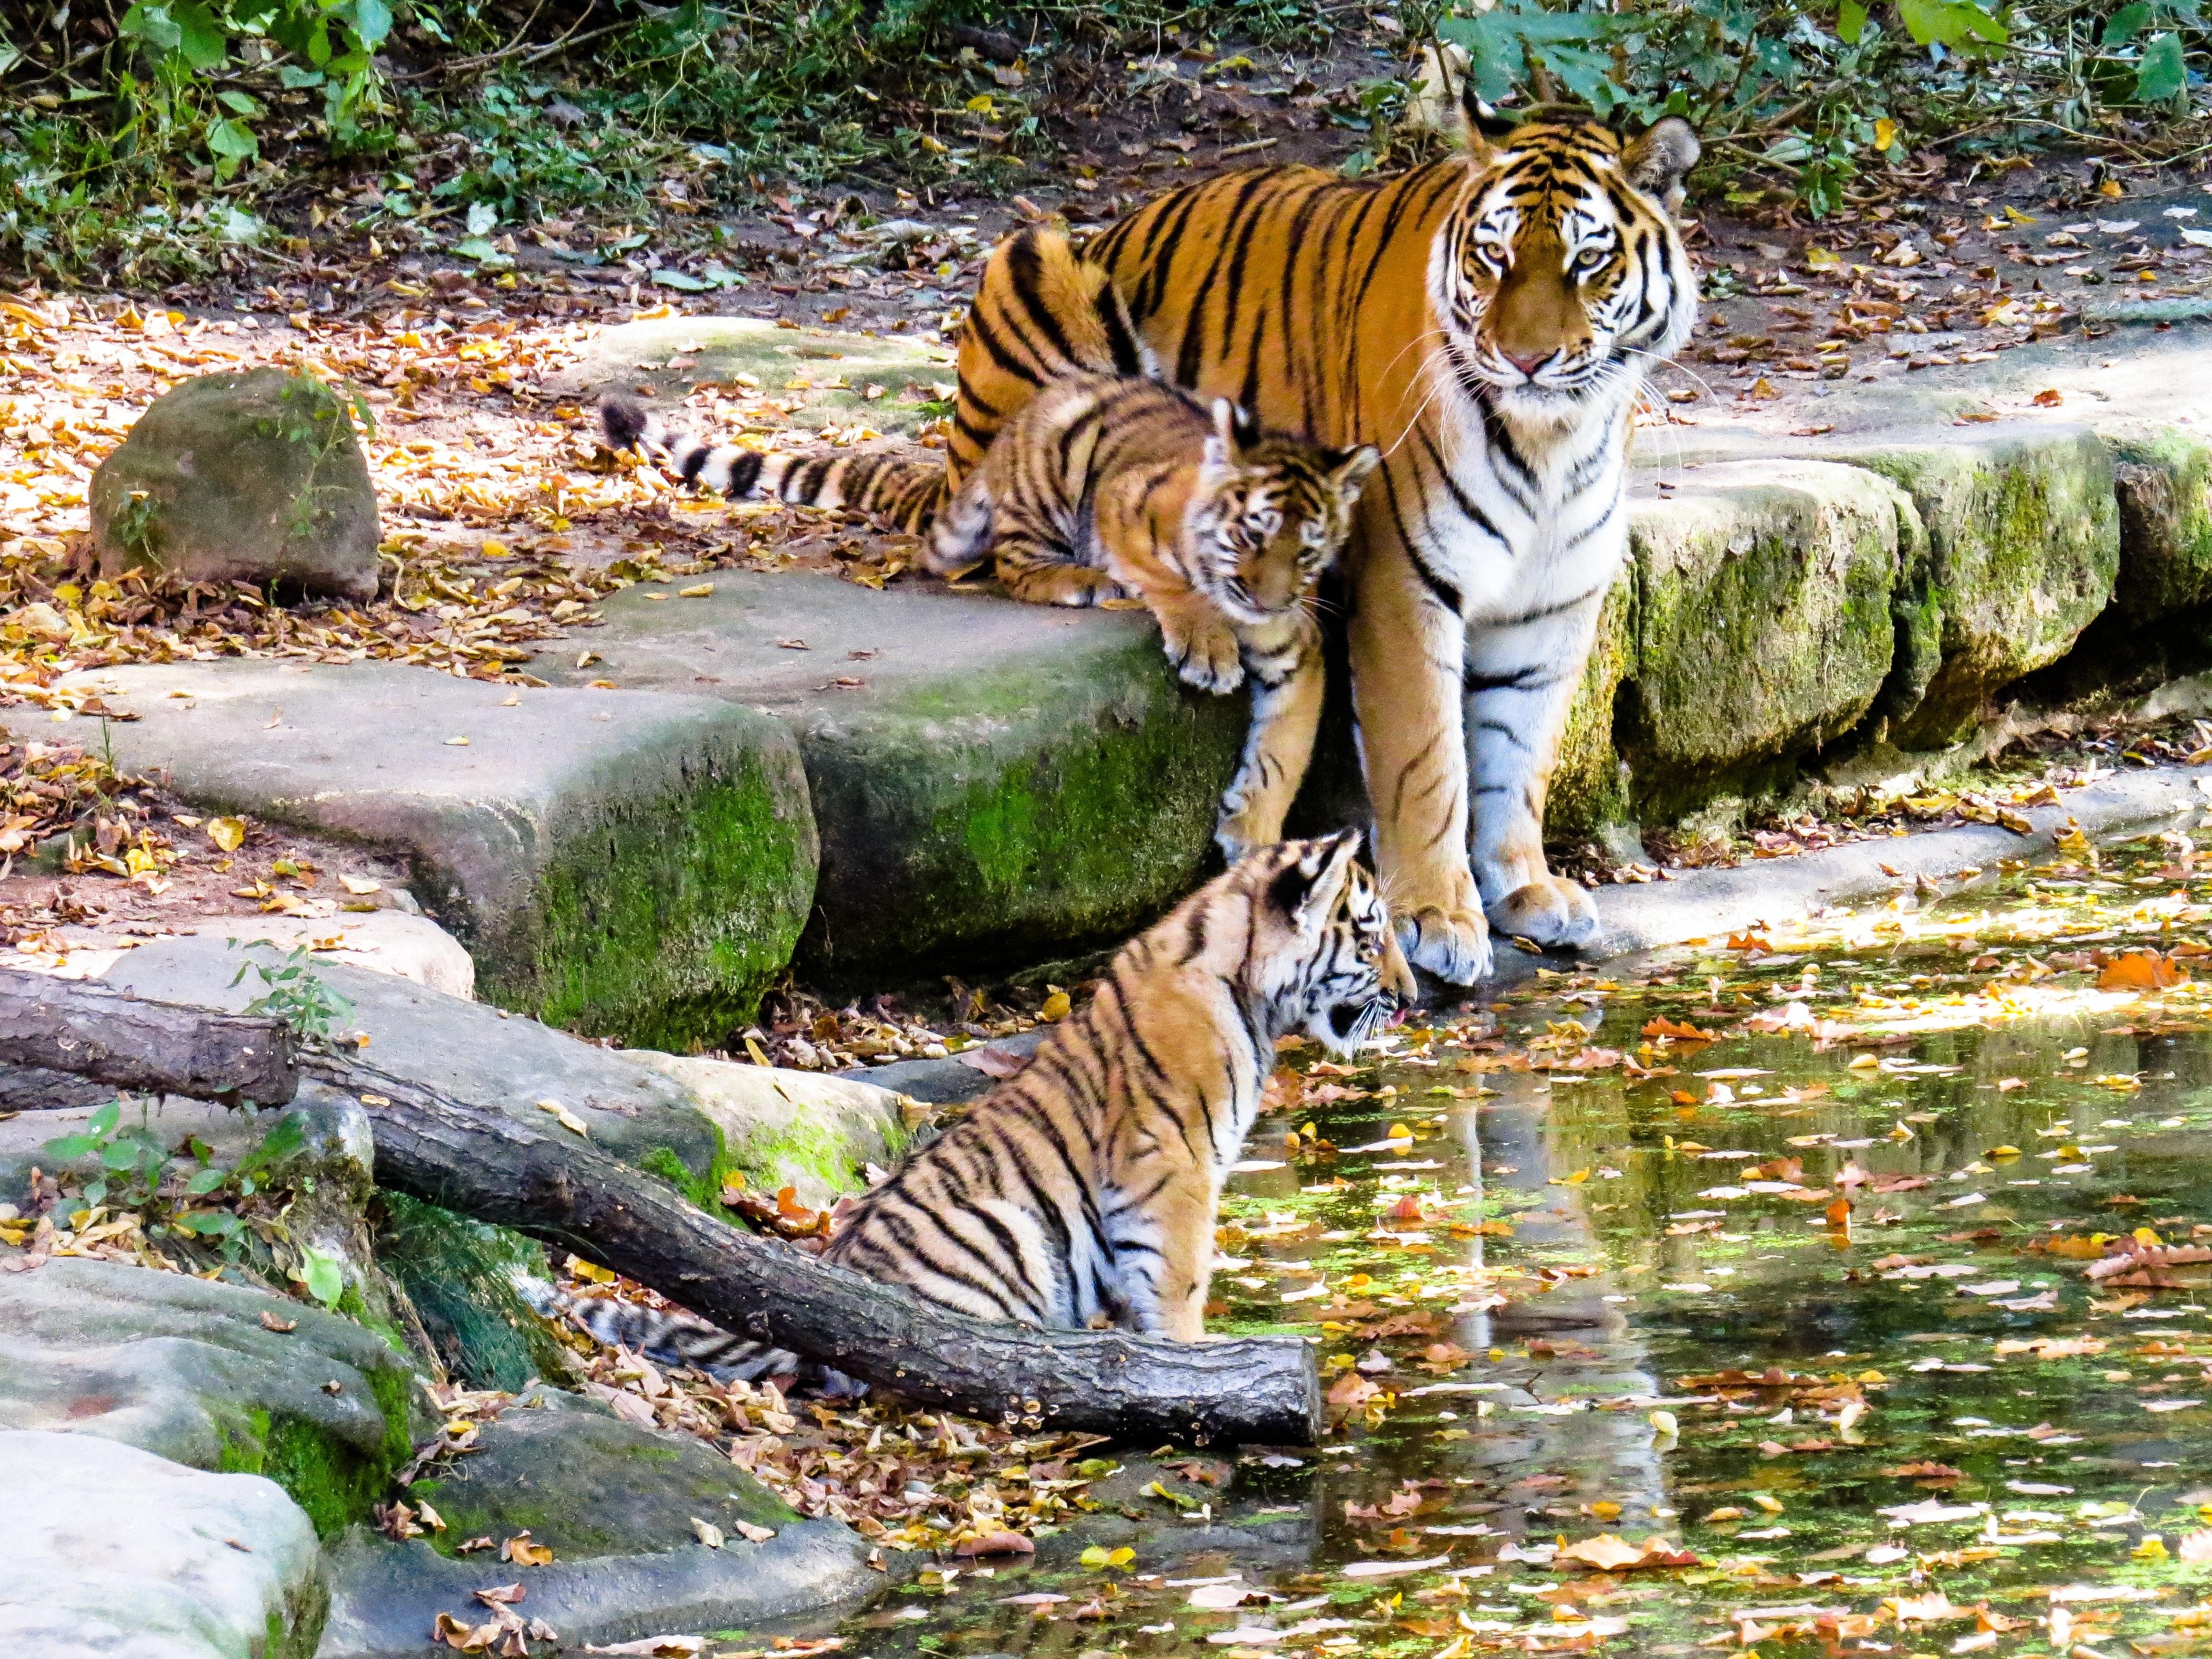 Apa Fungsi Kumis Pada Harimau